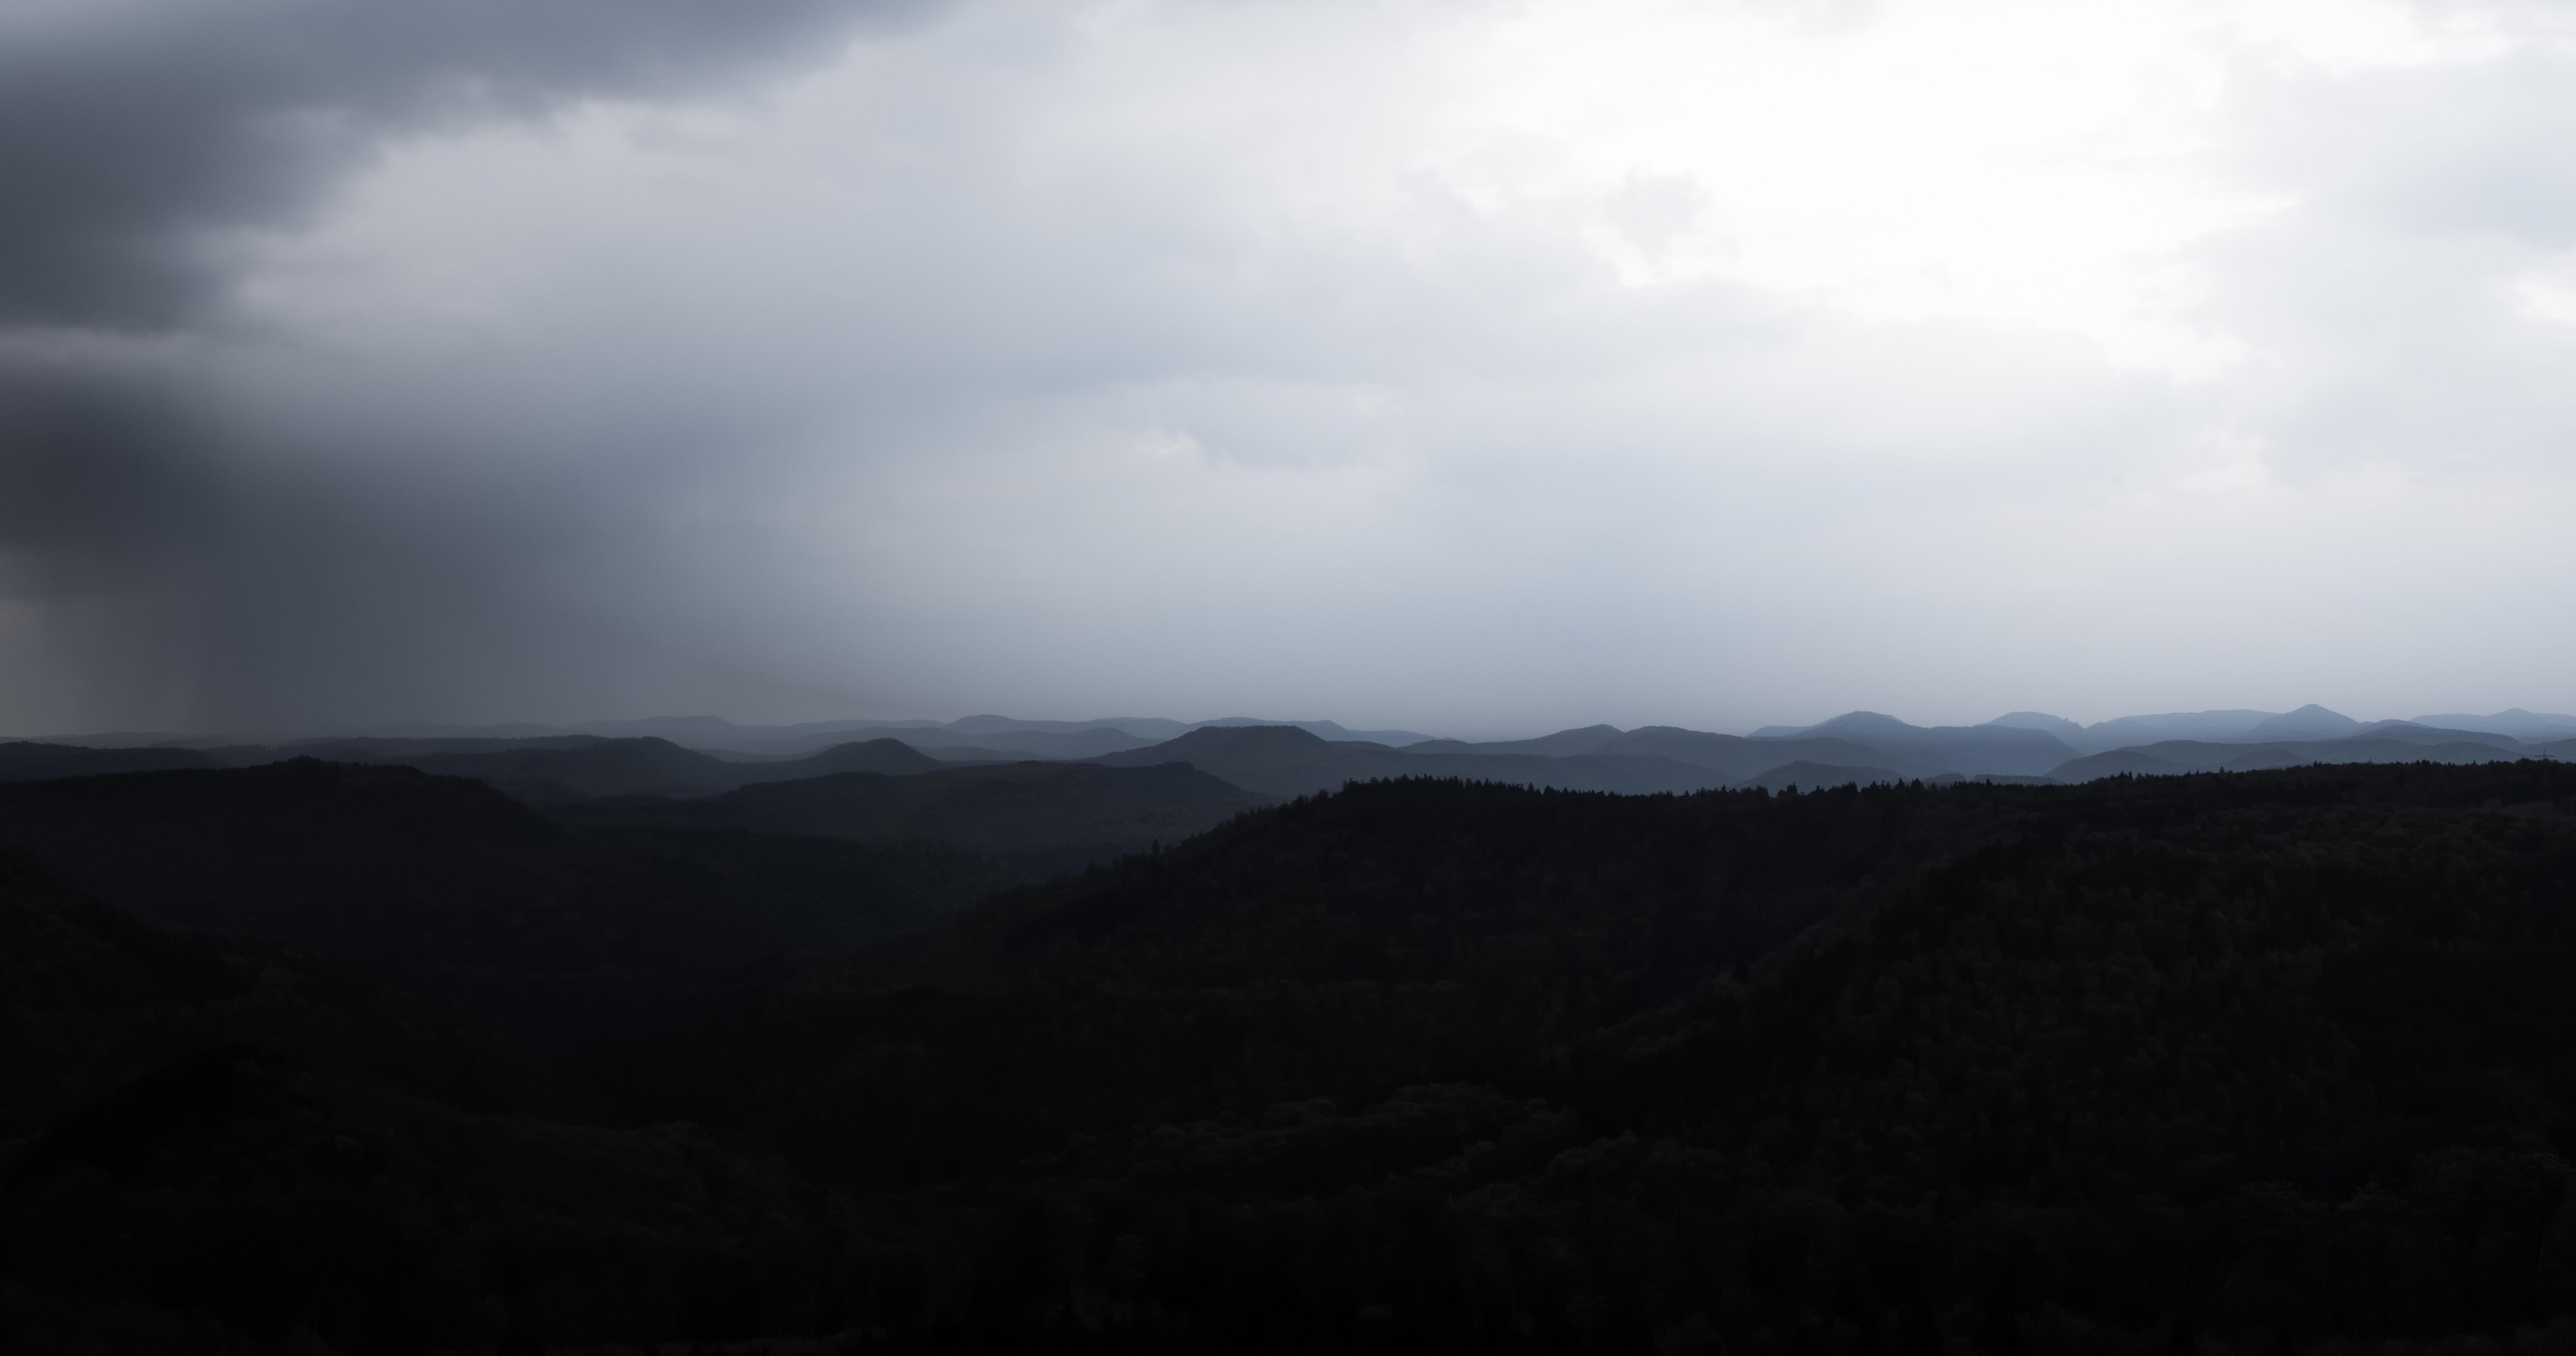 Gloomy silhouette of a mountain ridge on a foggy day